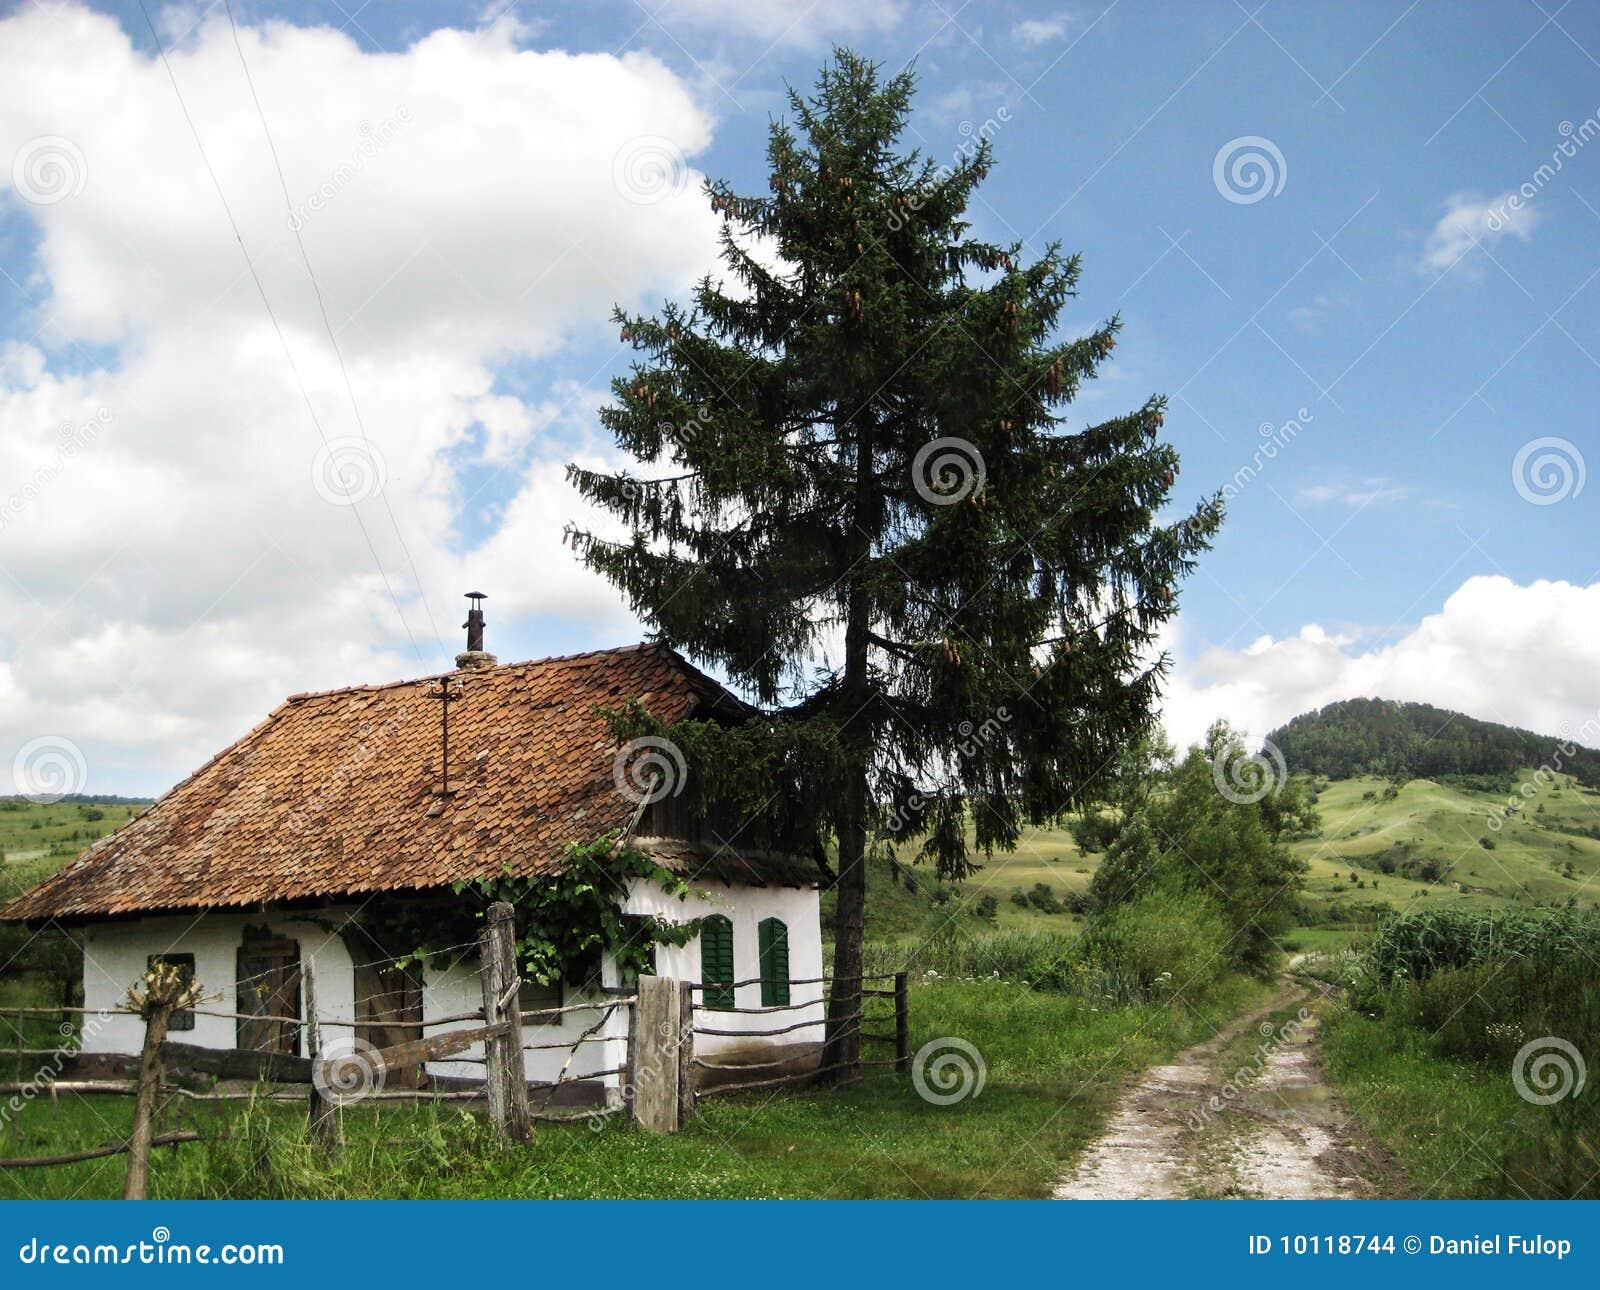 House in transylvania stock images image 10118744 - Saxon style houses in transylvania ...